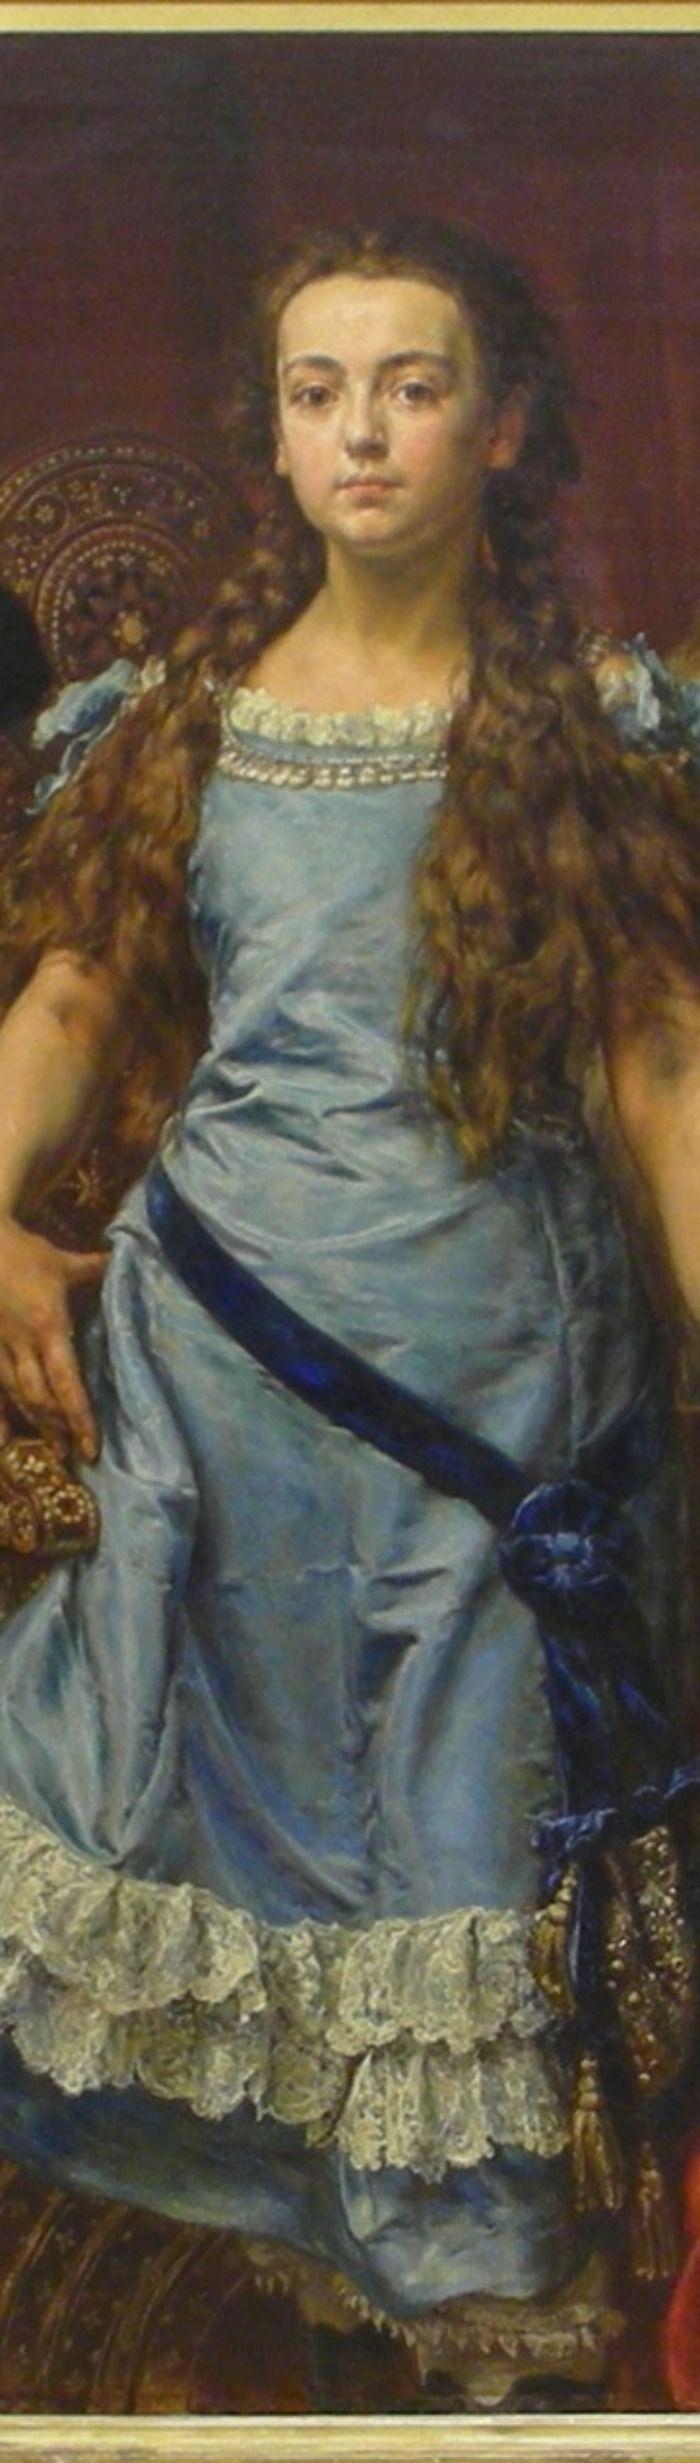 Polish painter's portrait of his children, detail (cropped) - Jan Matejko (1838 -1893)